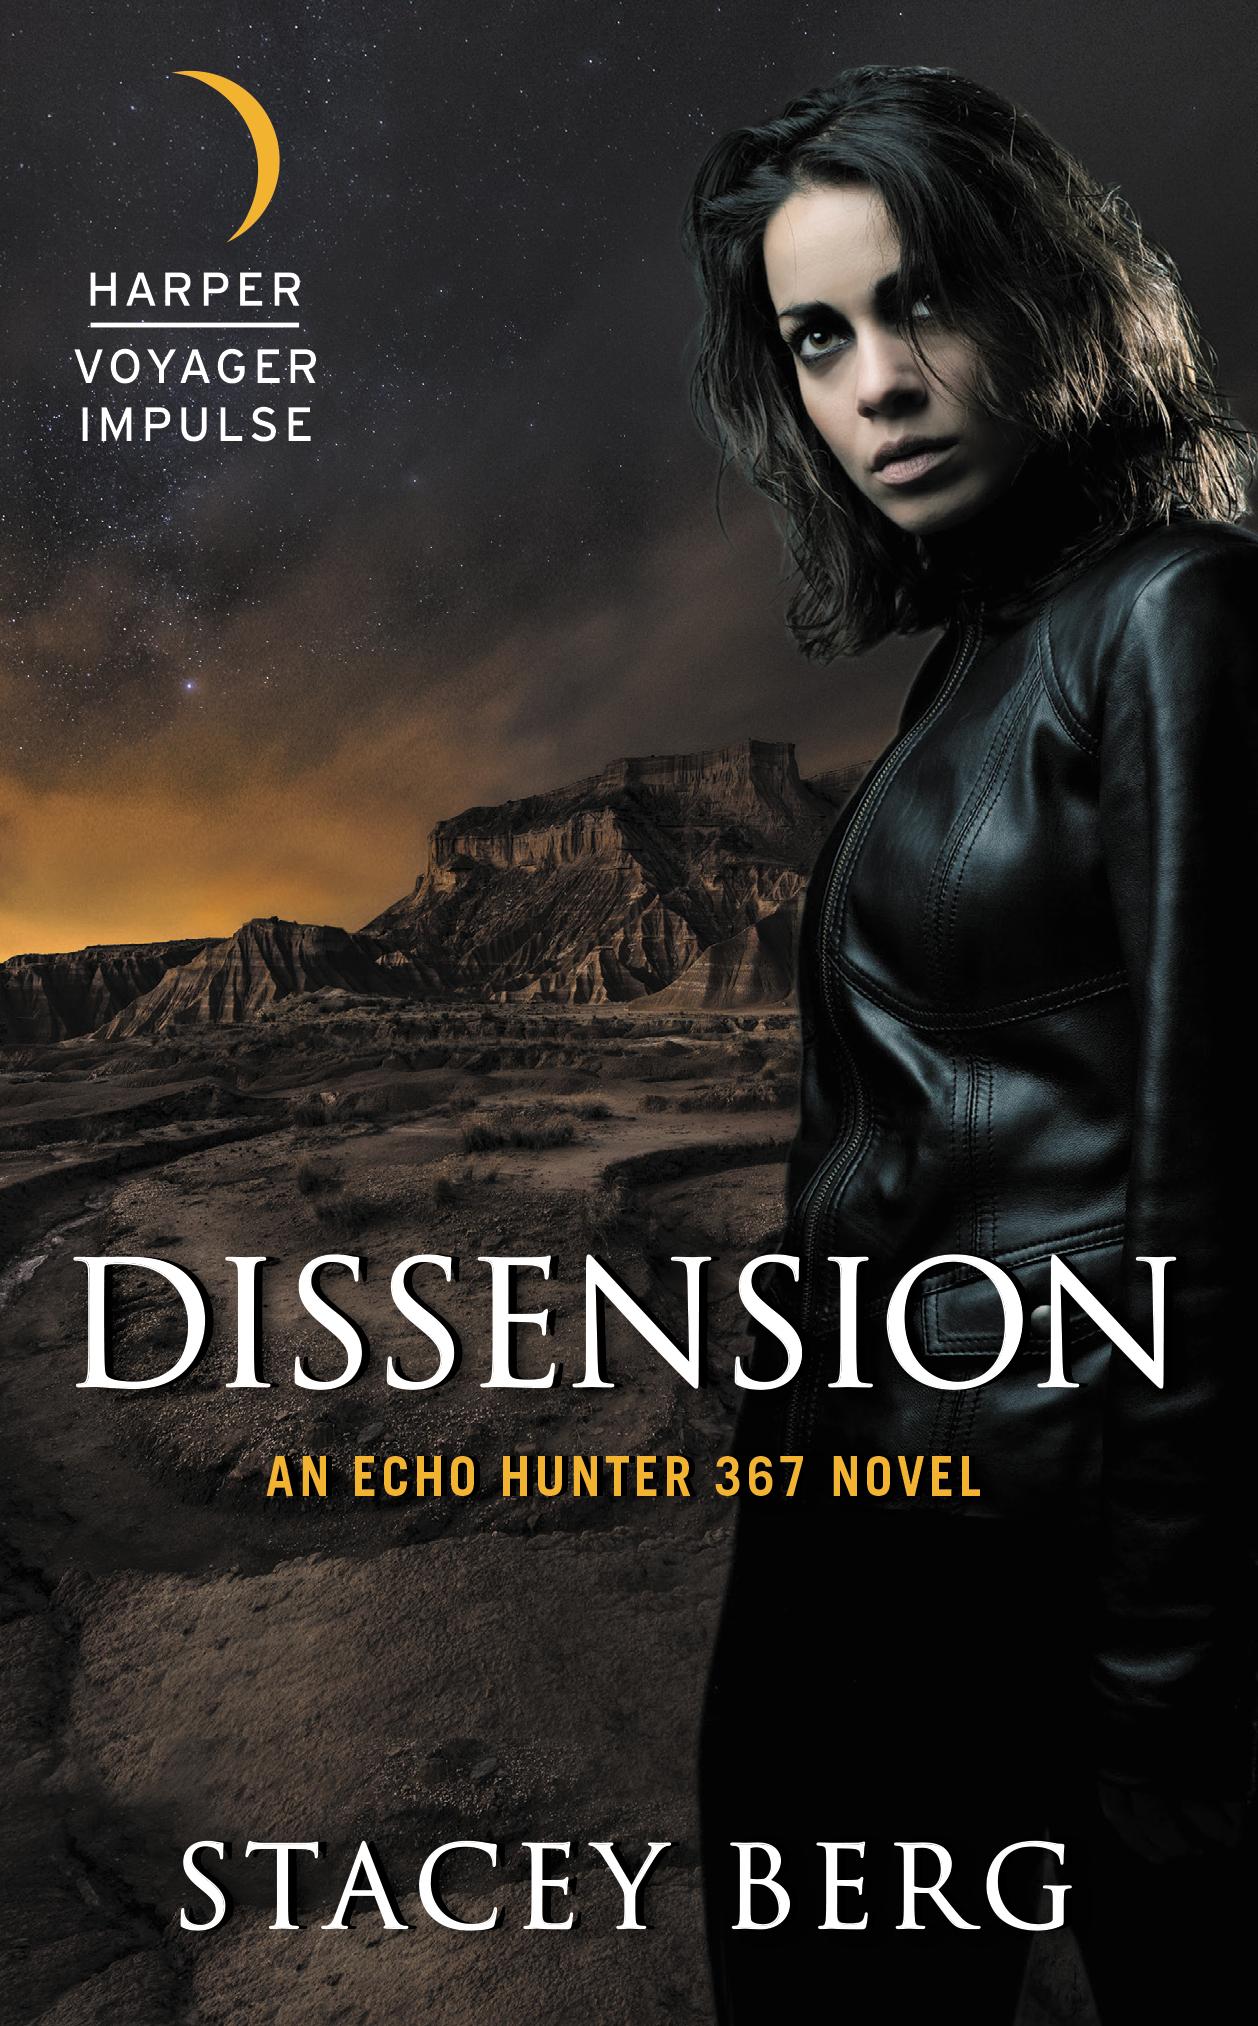 Dissension cover